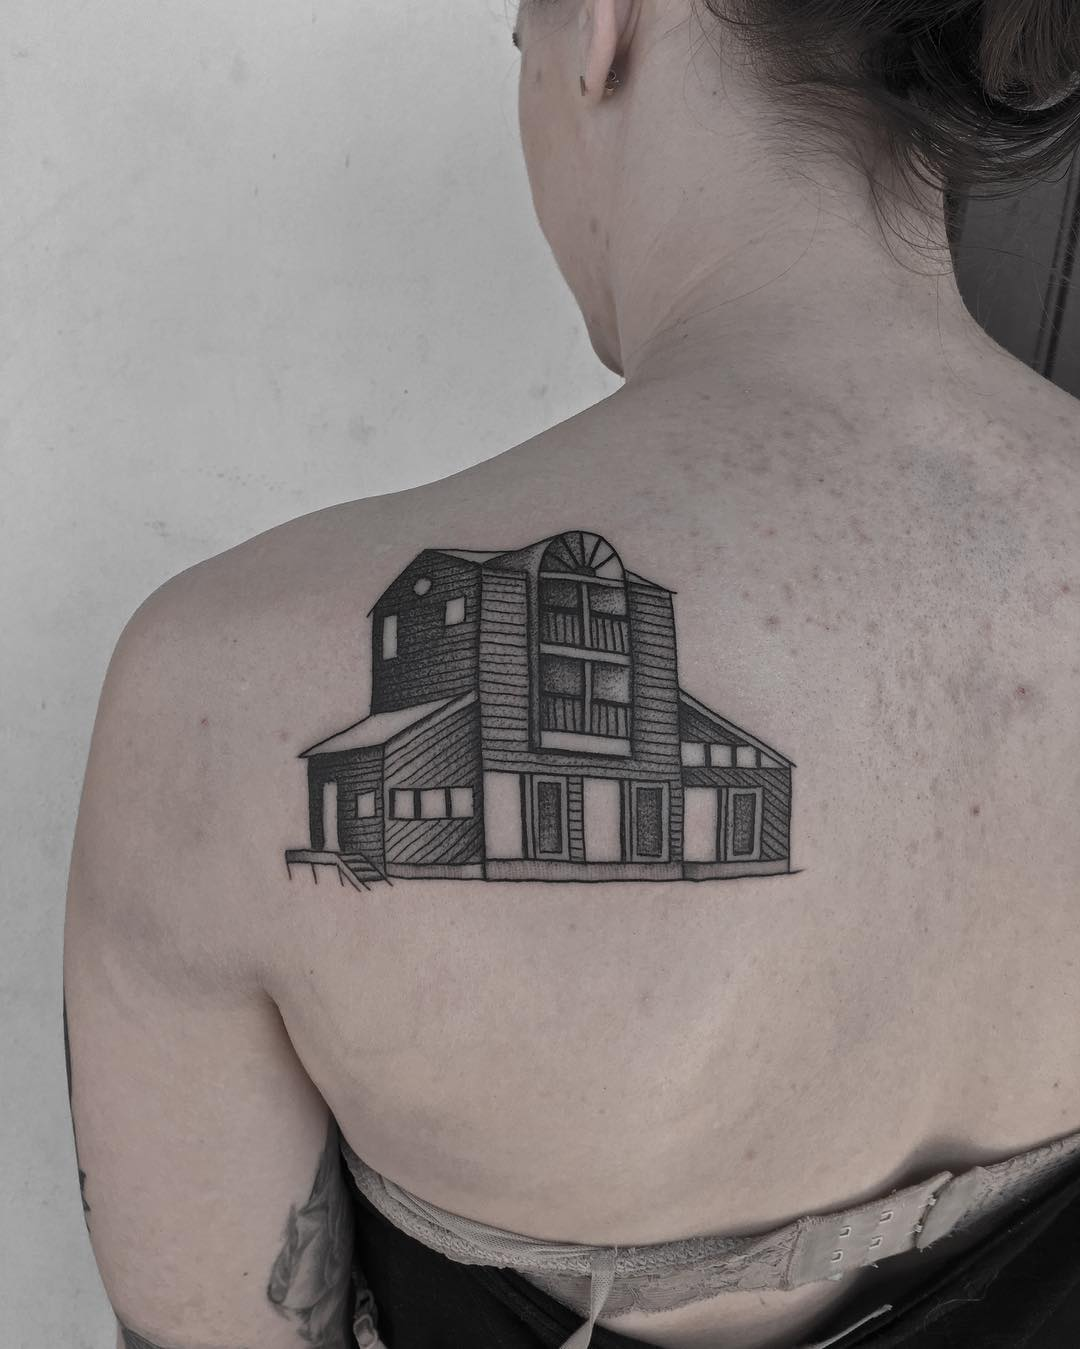 Childhood home tattoo by @justinoliviertattoo